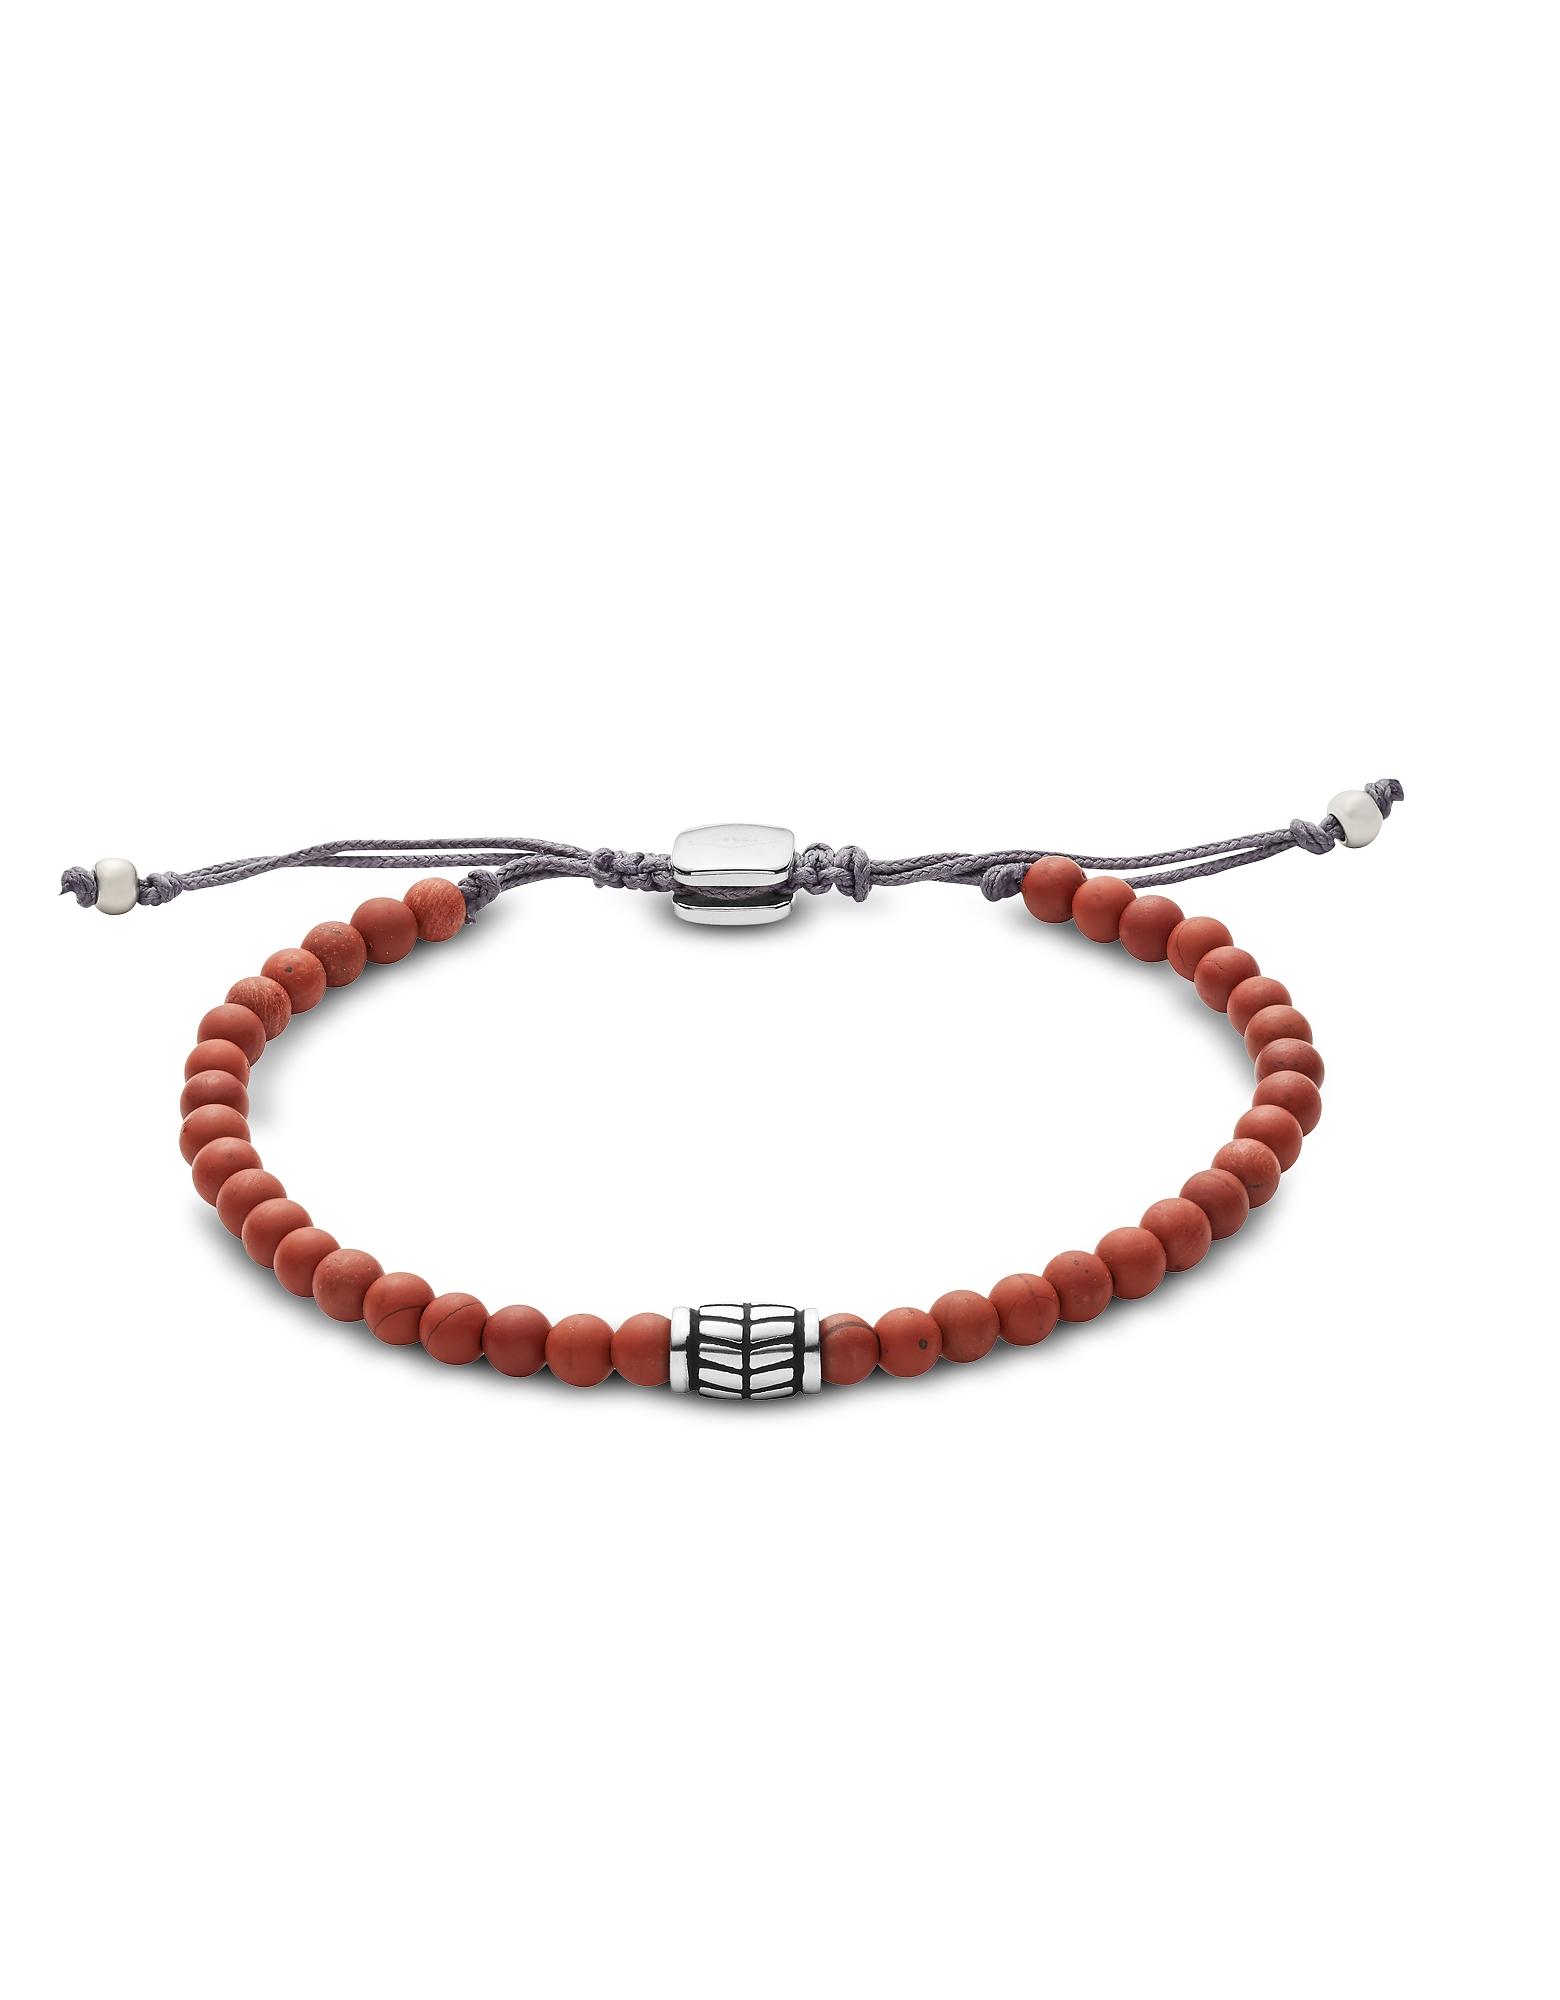 Fossil Men's Bracelets, Men's Red Semi-Precious Bracelet